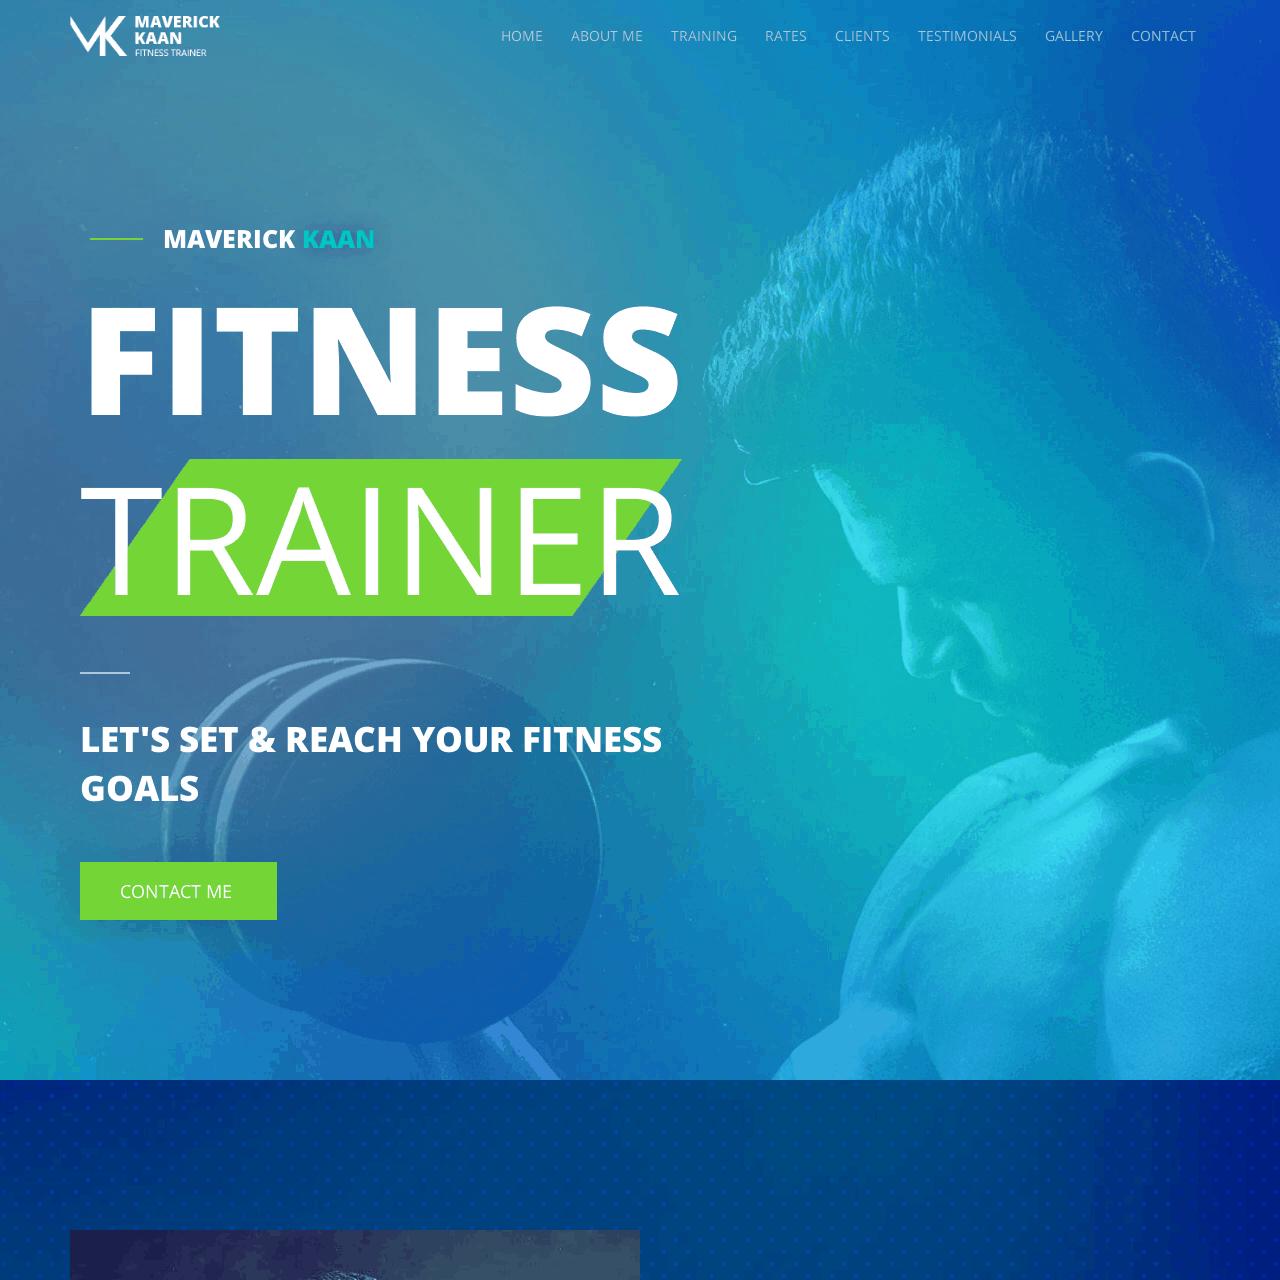 fitness-training-website-design